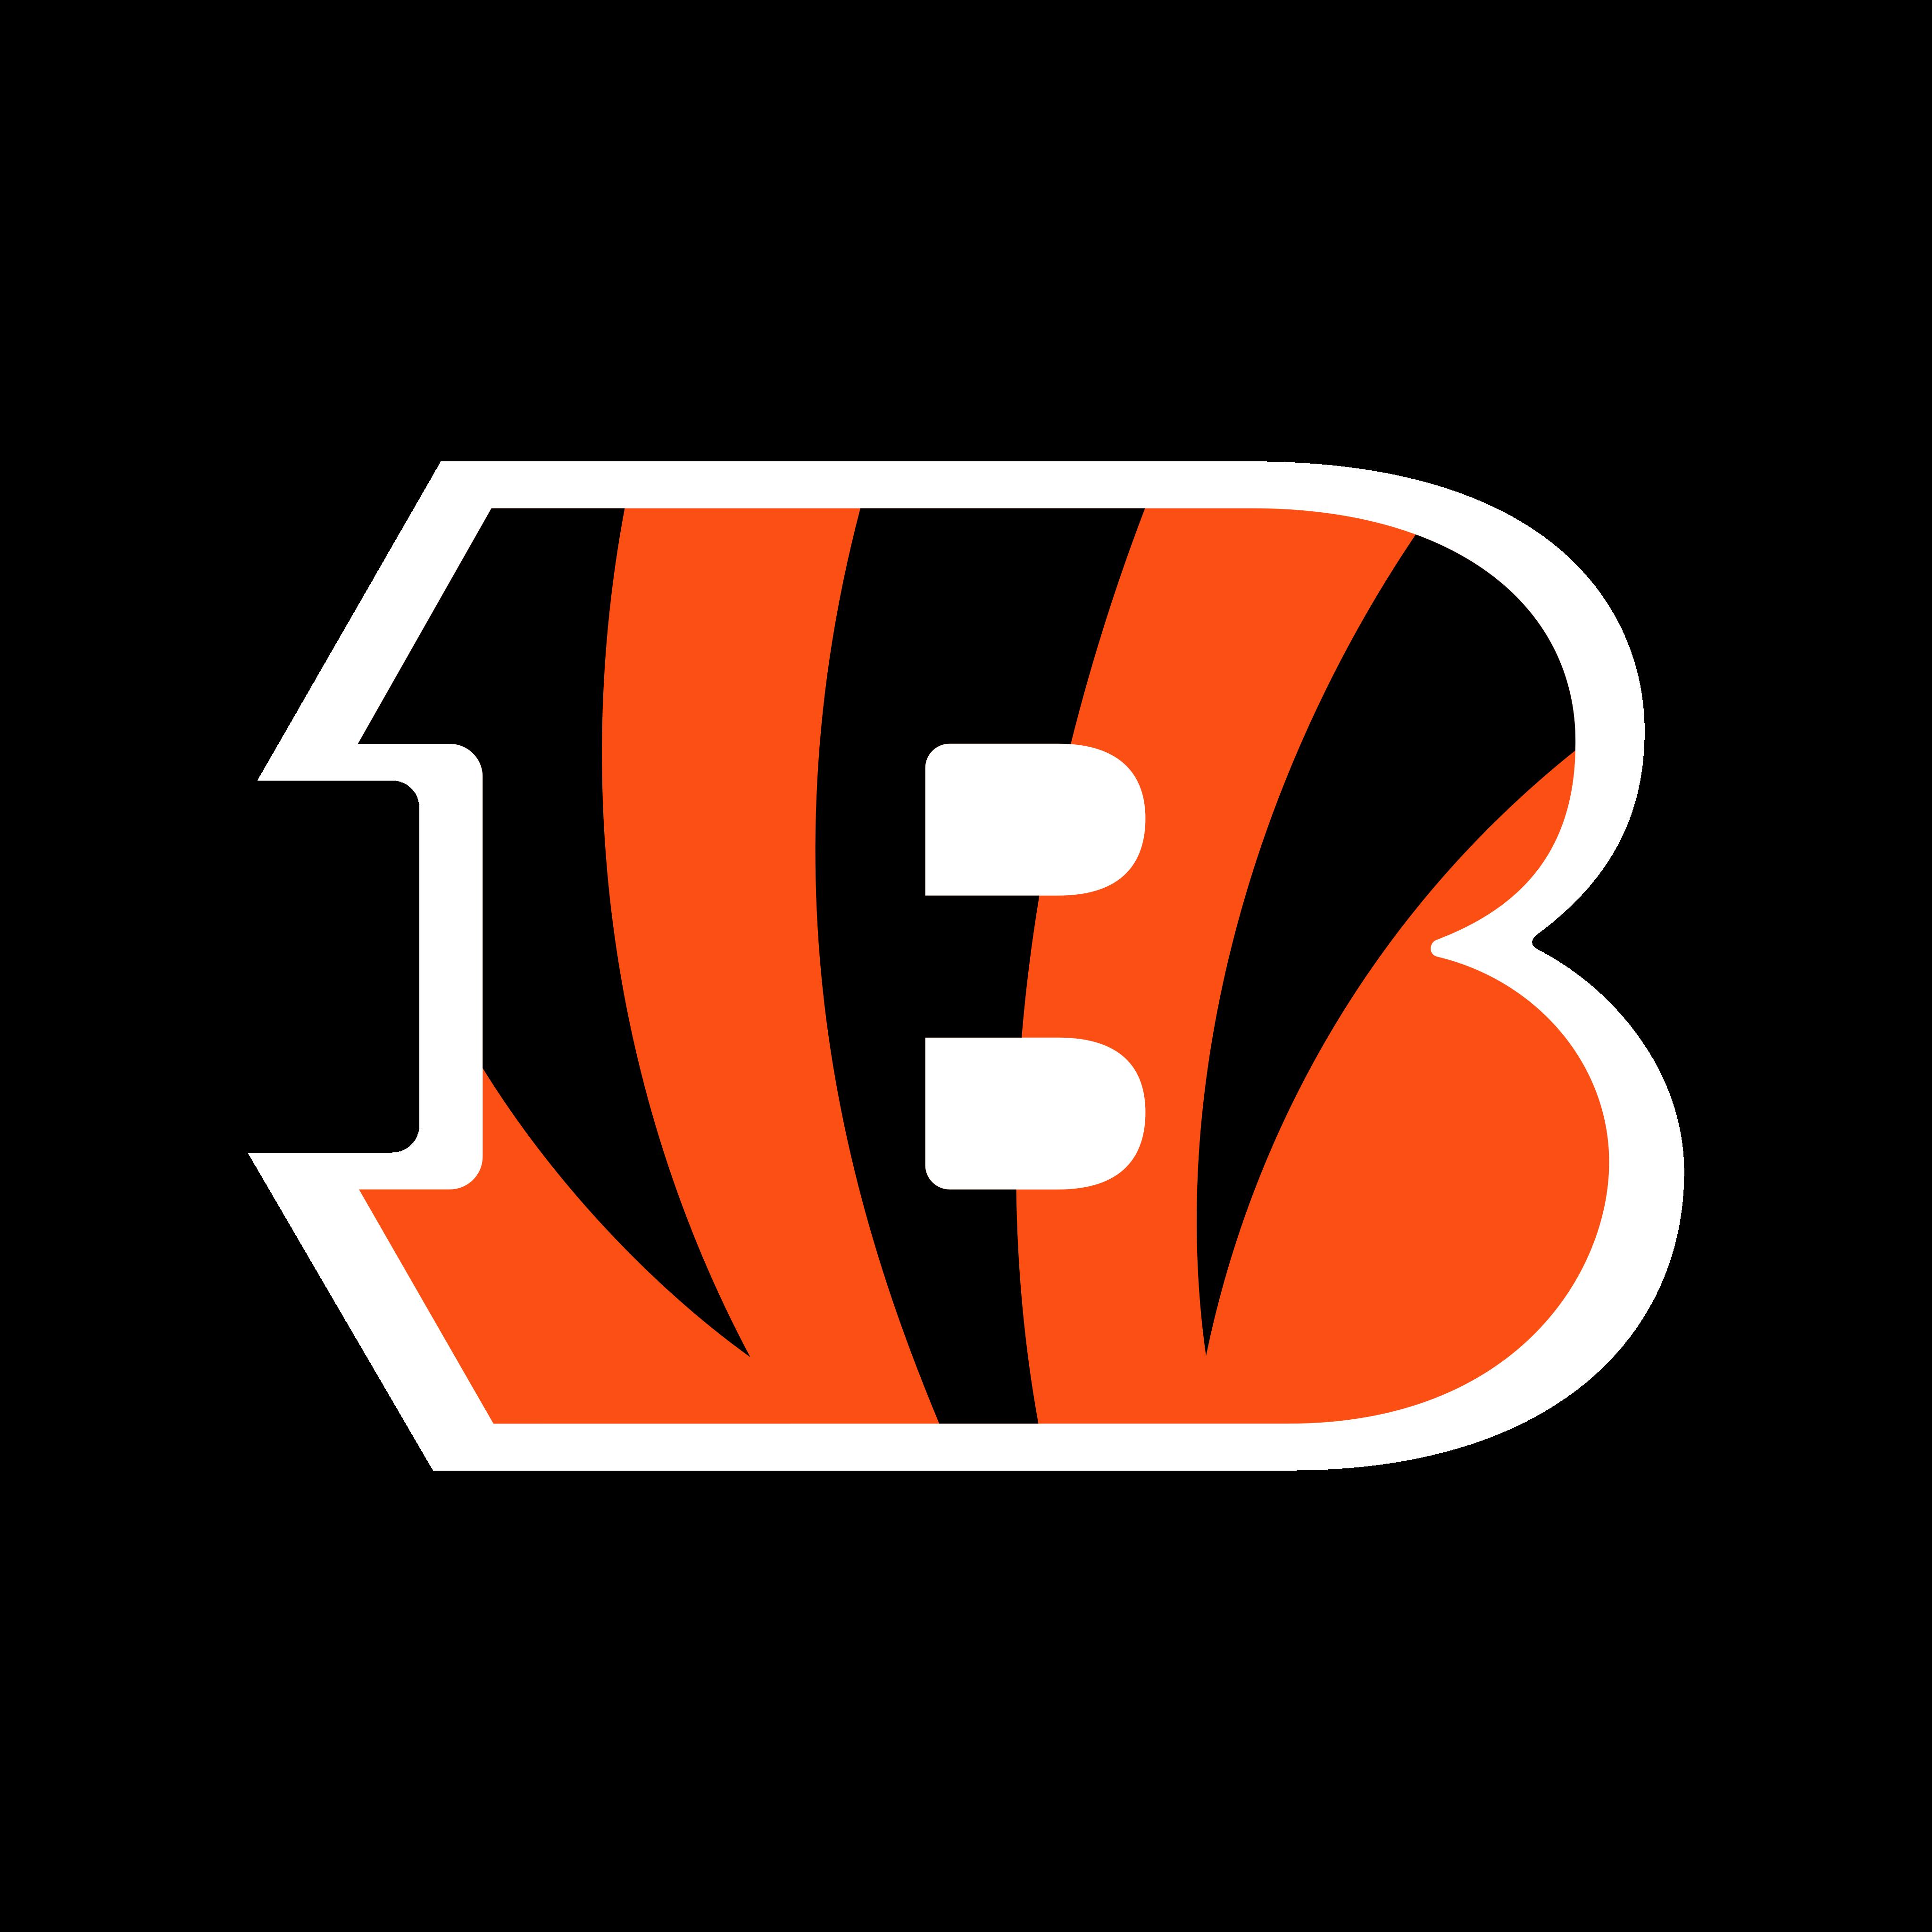 cincinnati bengals logo 0 - Cincinnati Bengals Logo